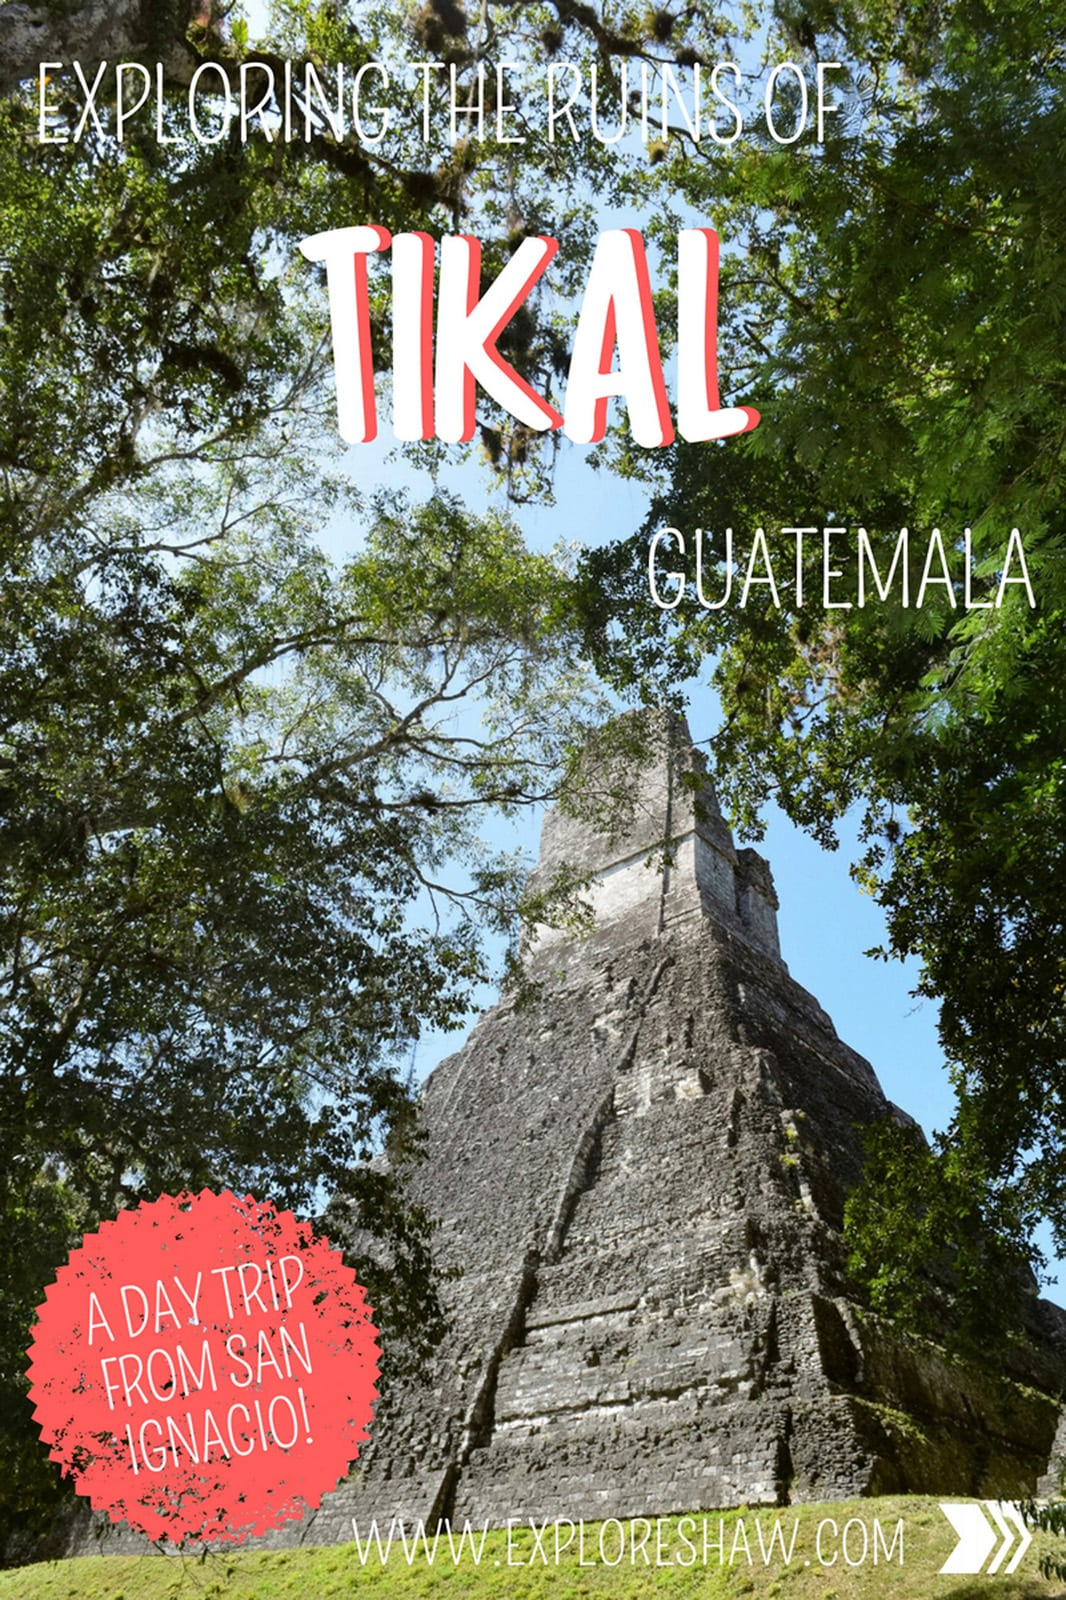 EXPLORING THE RUINS OF TIKAL GUATEMALA